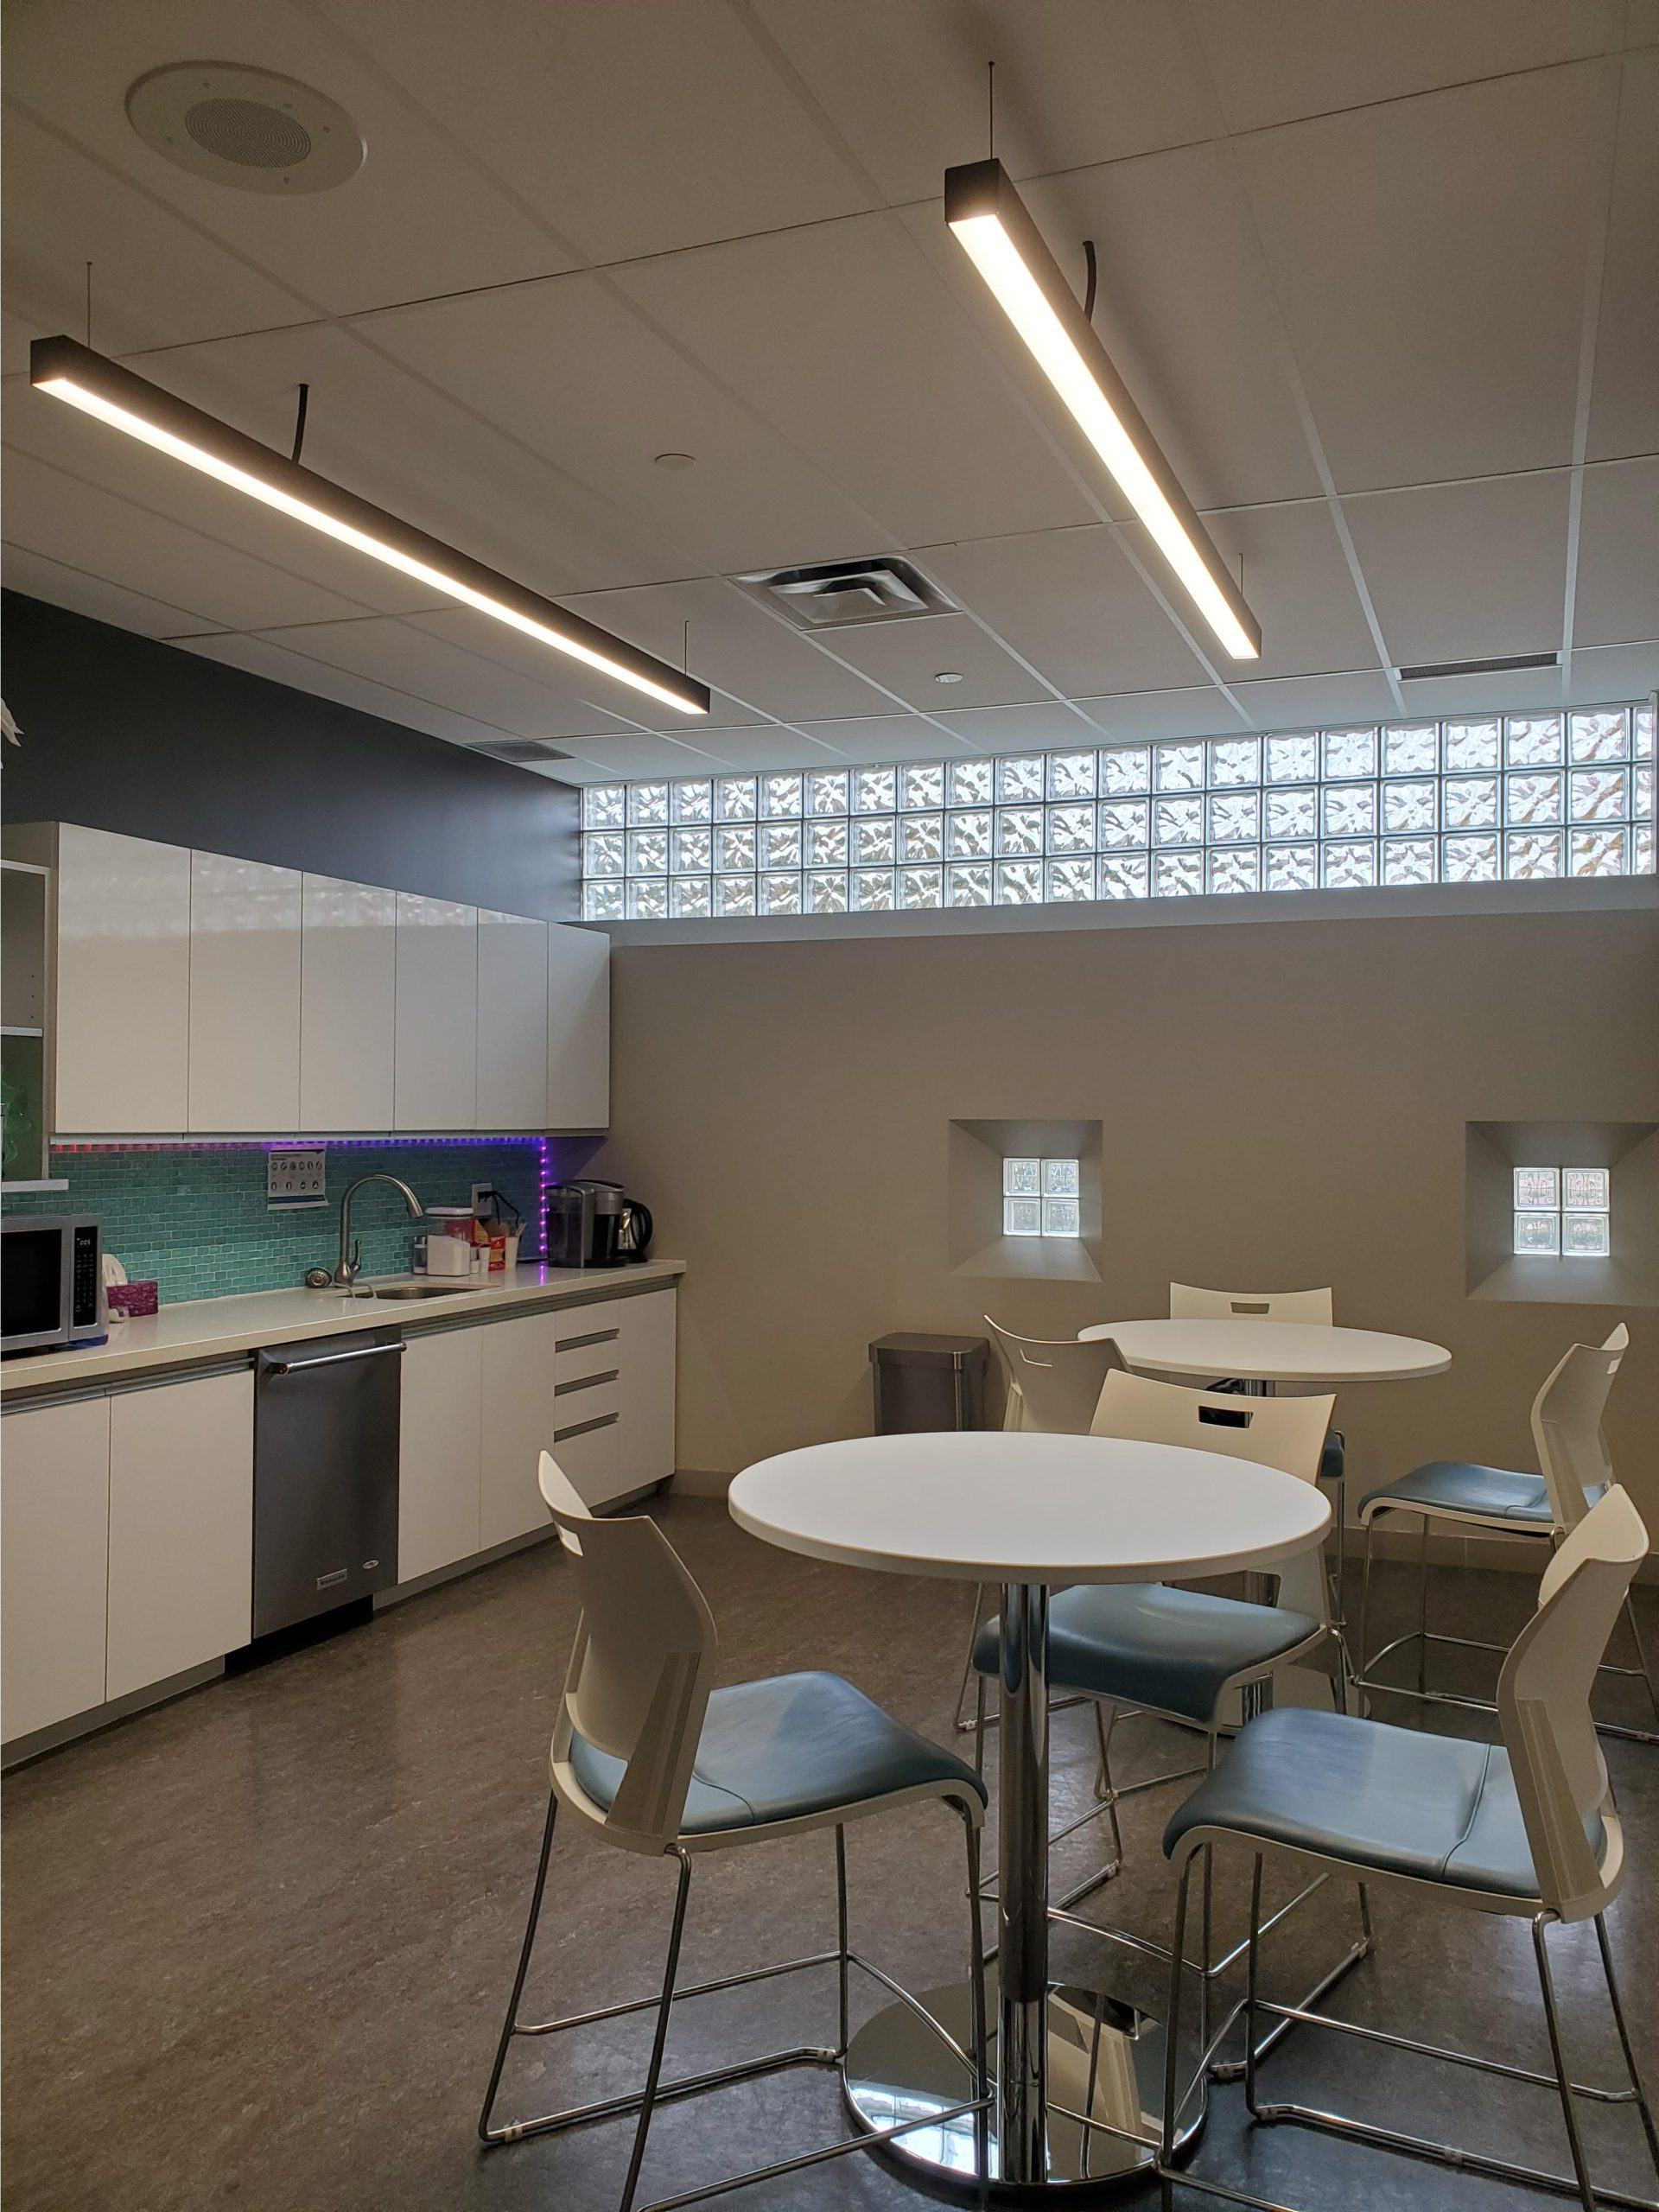 data centre facility kitchen and tables decorative